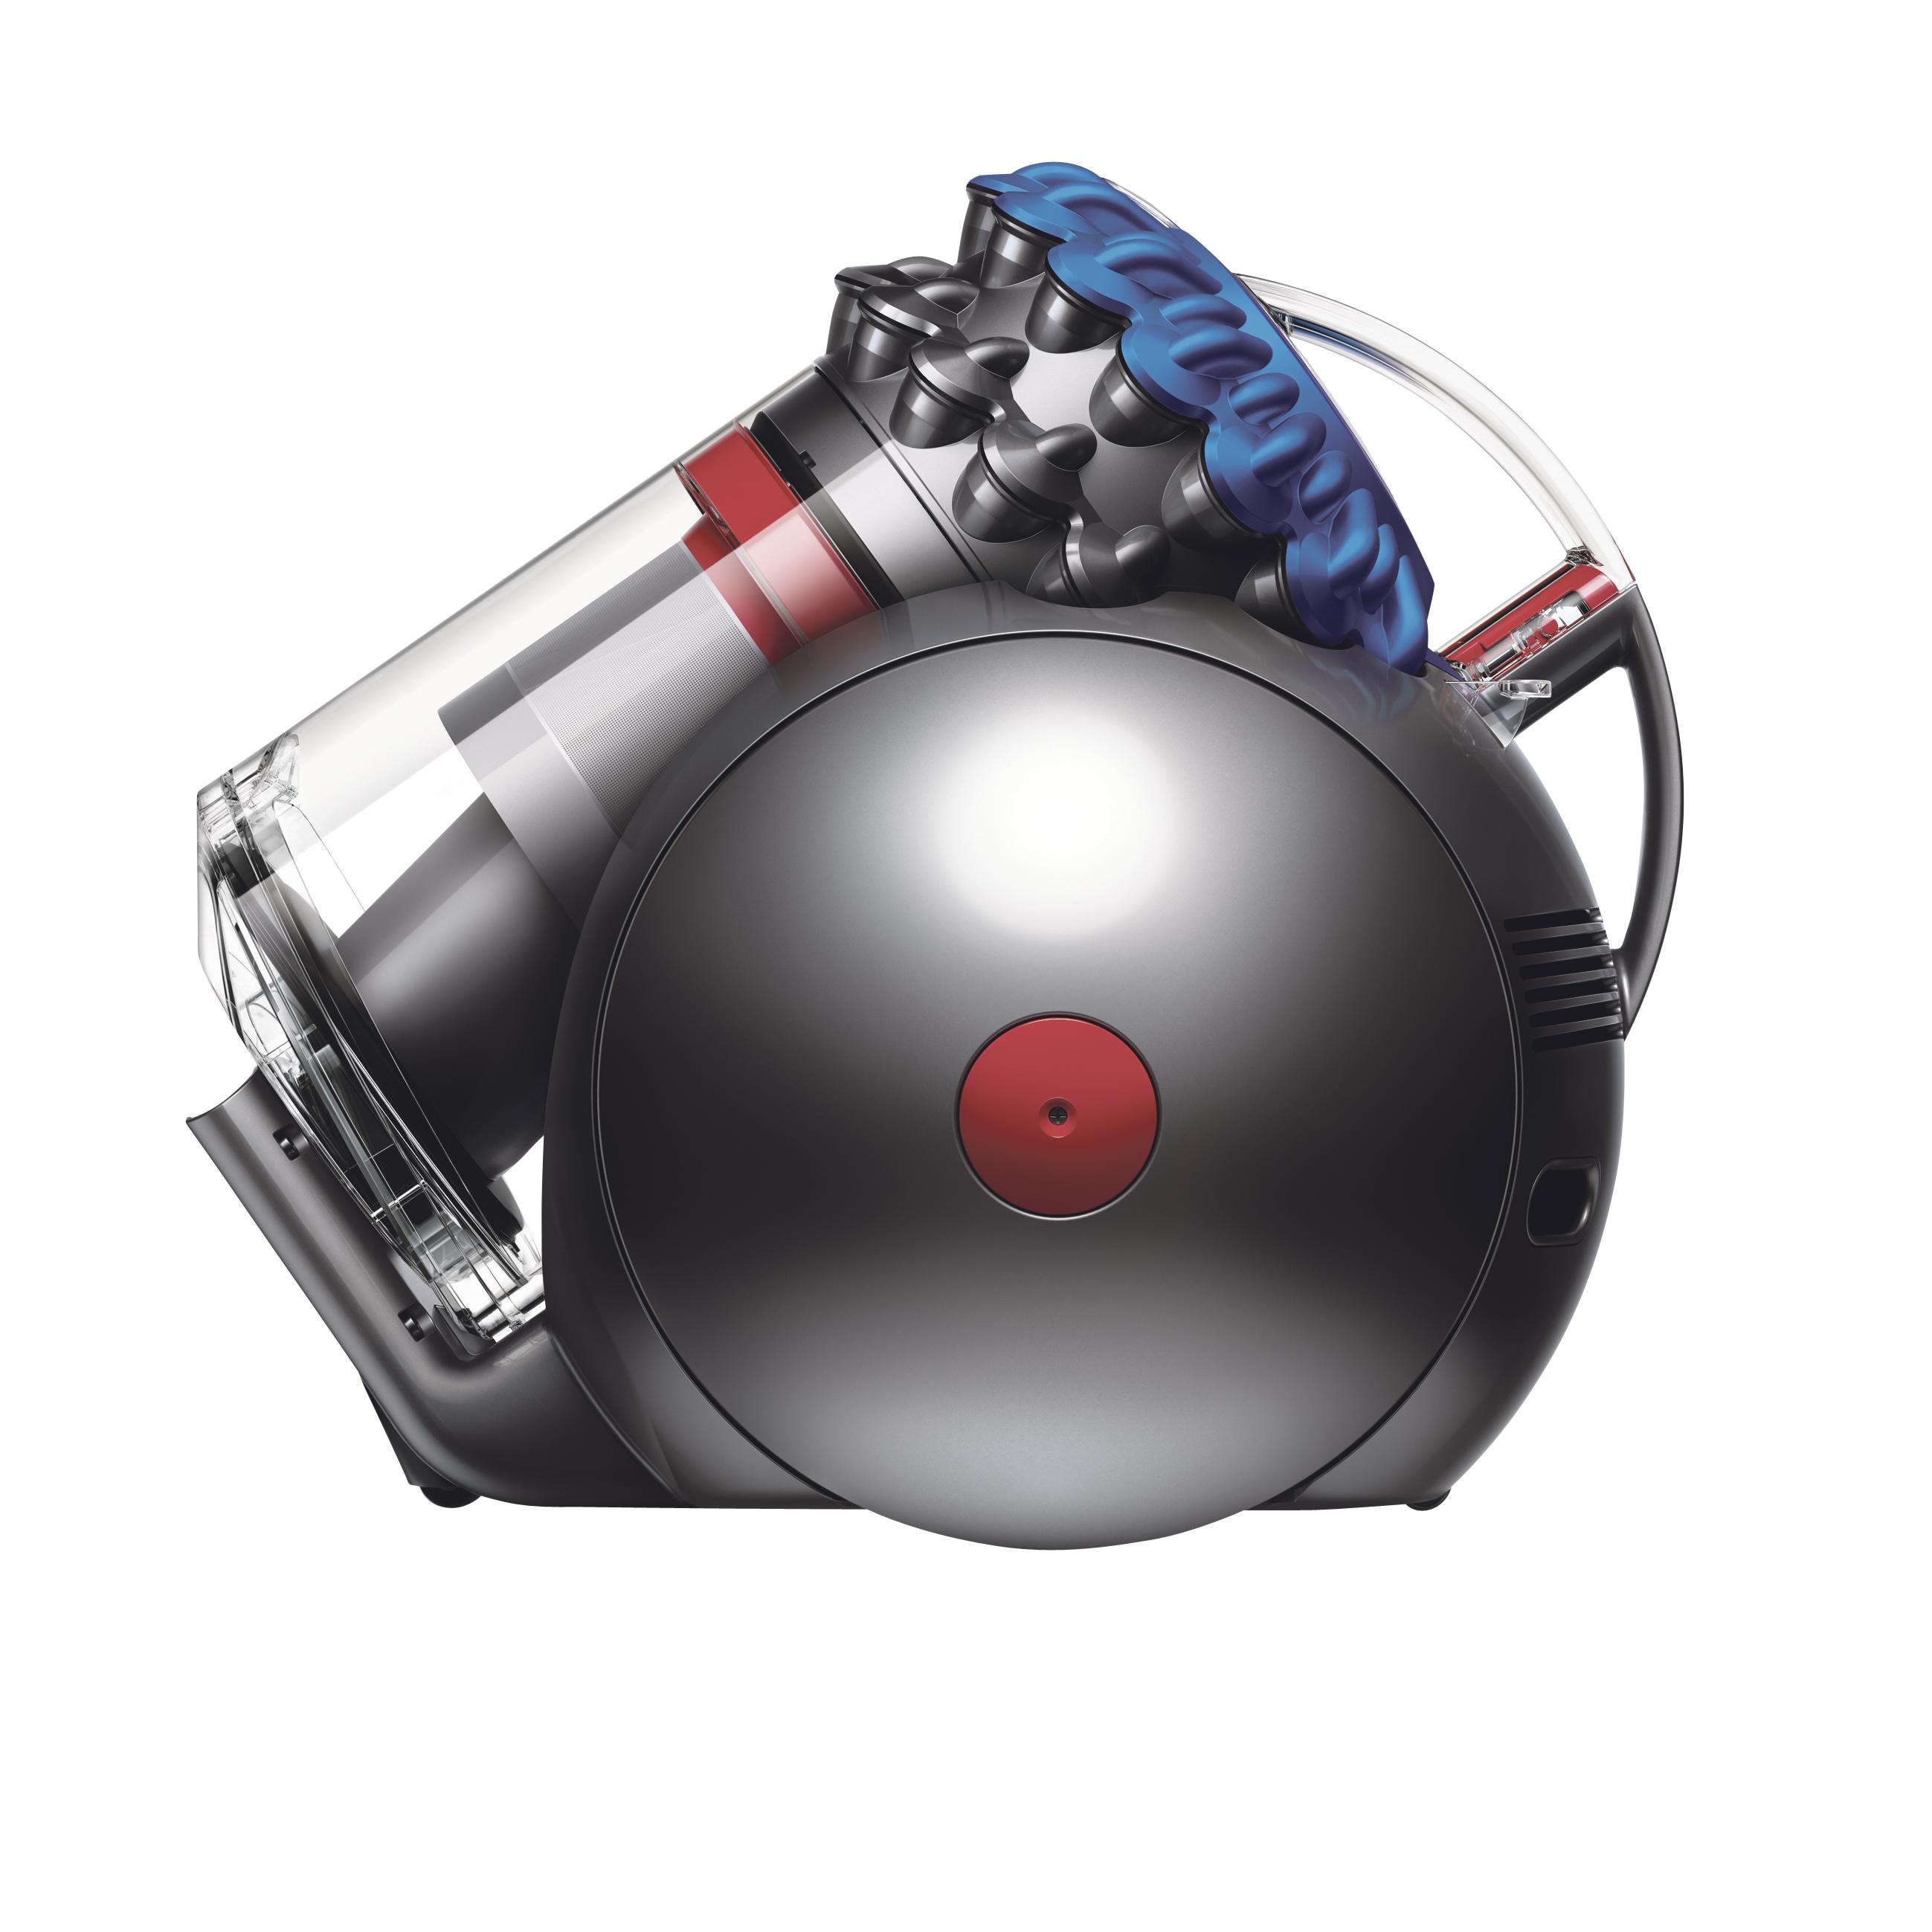 Dyson Bigball Multifloor Pro